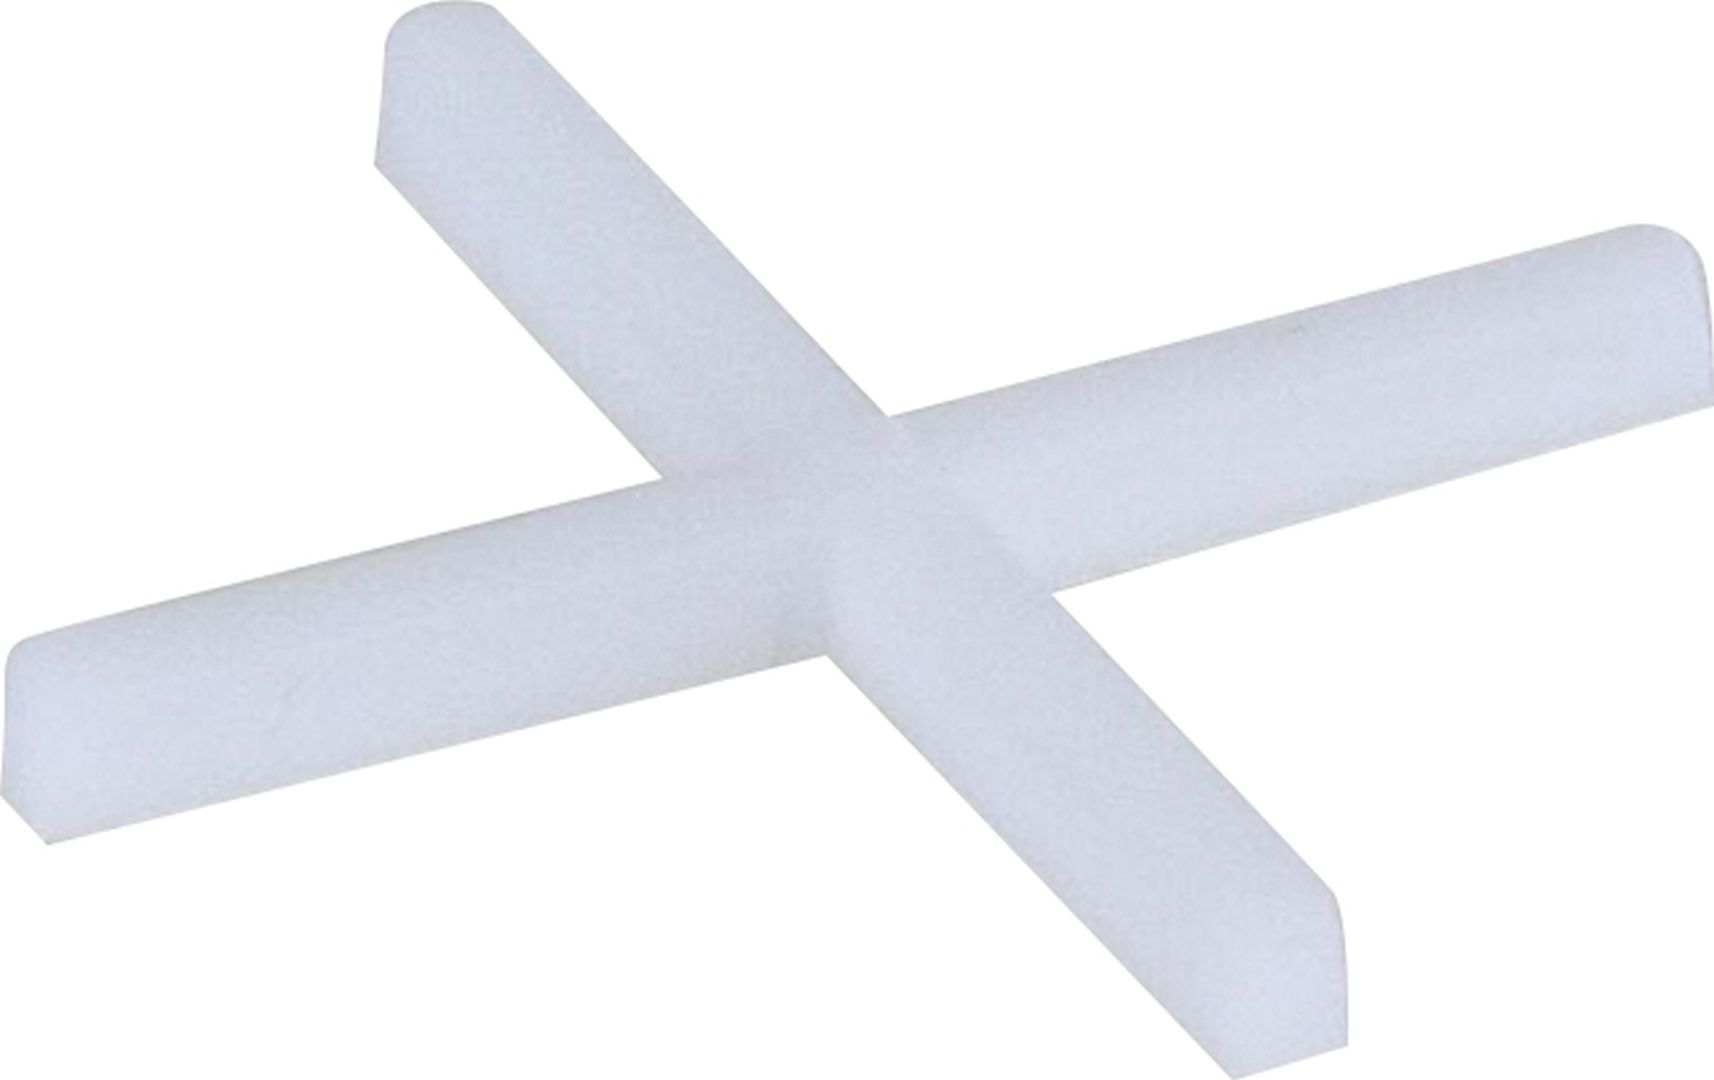 TRIUSO Fliesenkreuze aus Kunststoff, weiß, 250 Stück, 4,0 mm